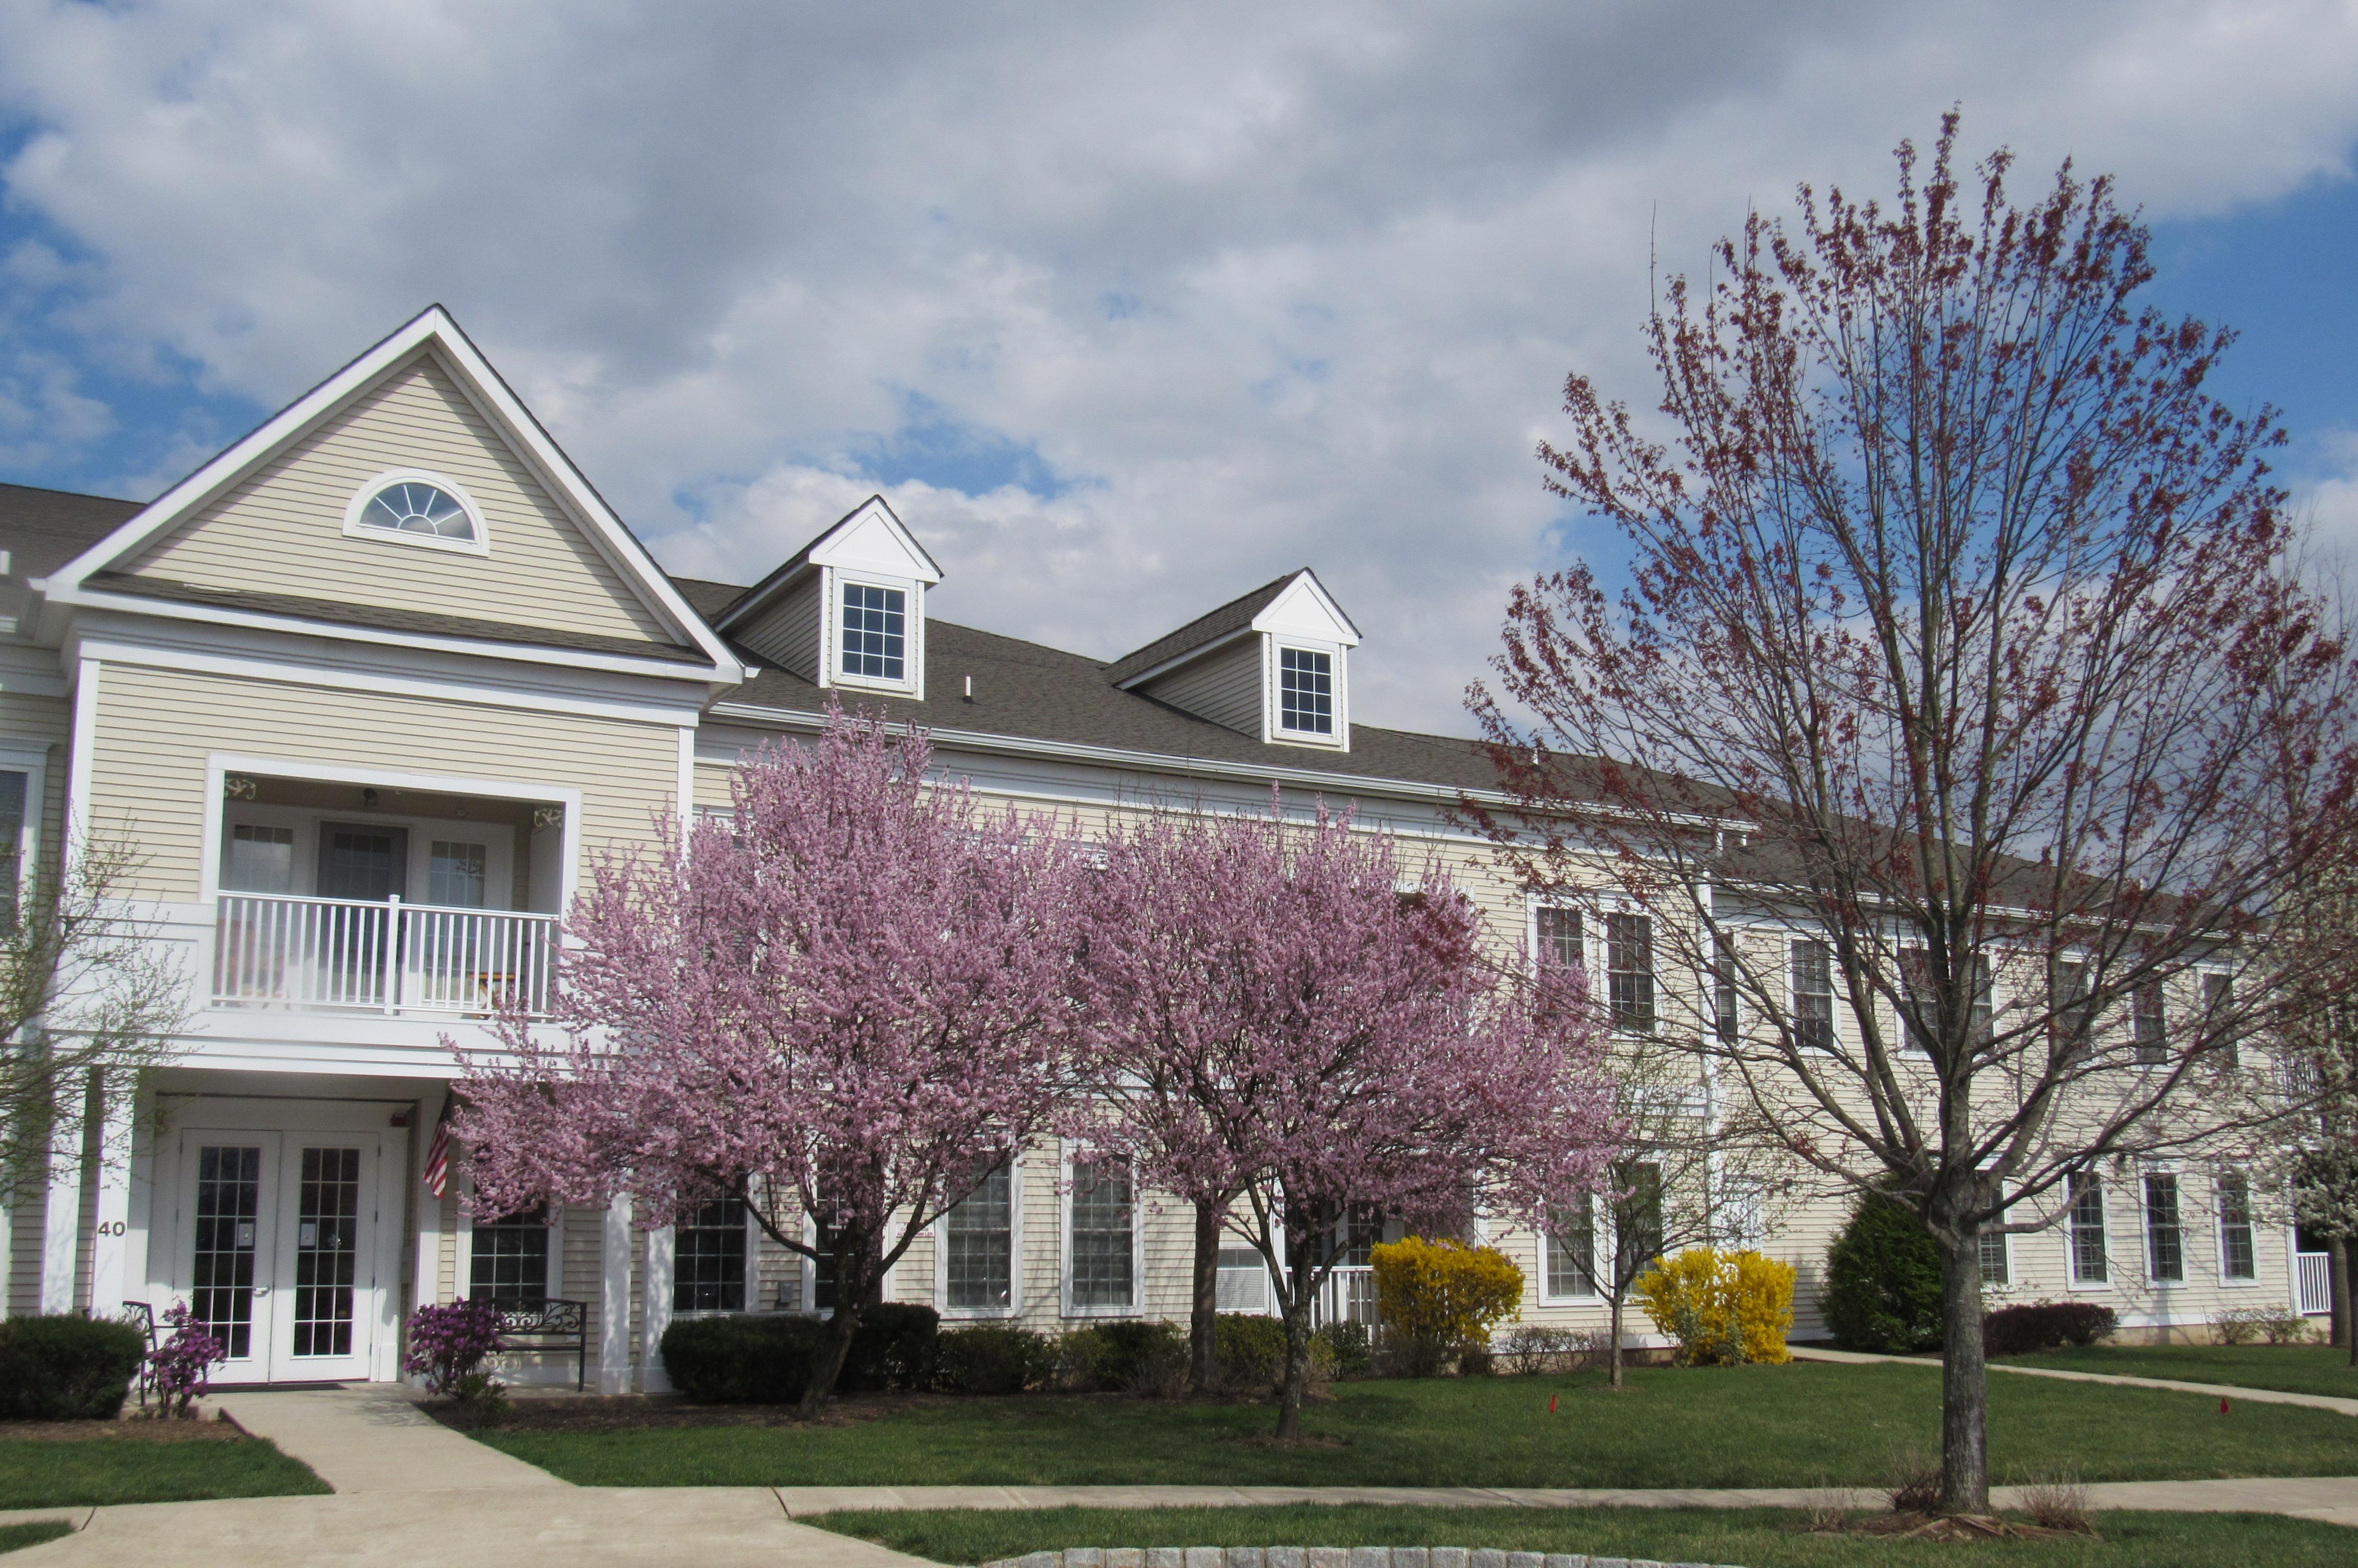 6012 Brookfield Glen Dr. White Township, NJ 08823